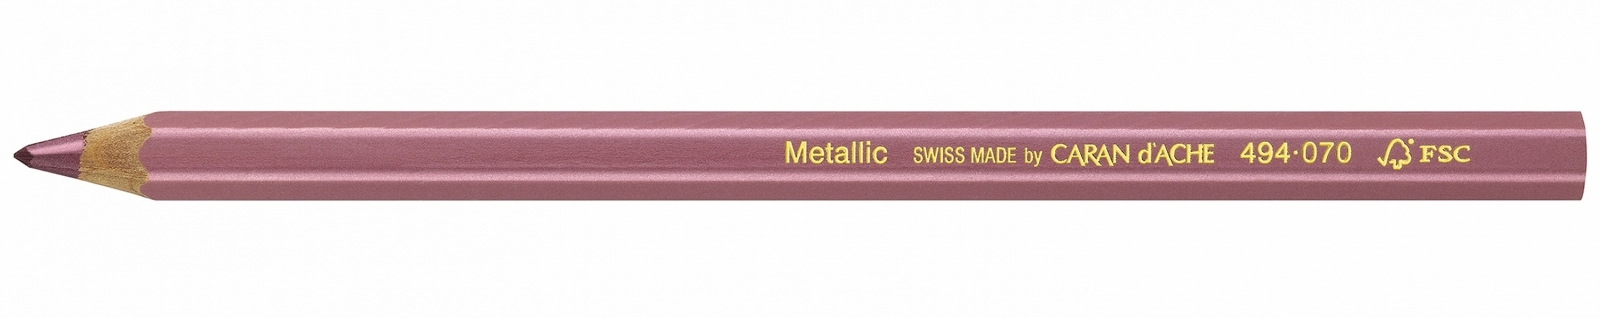 Lápis Maxi Jumbo Metallic Carandache 494 070 Lilas - Papelaria Botafogo